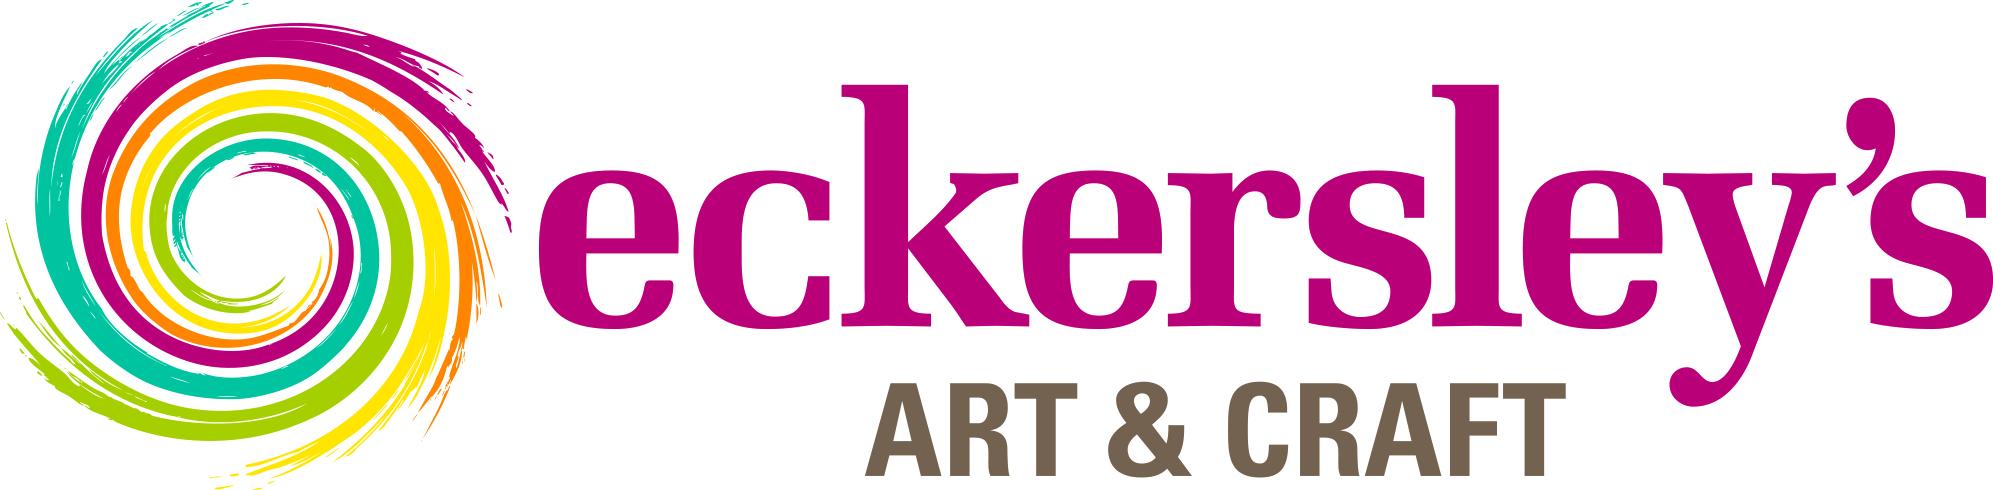 Eckersley's